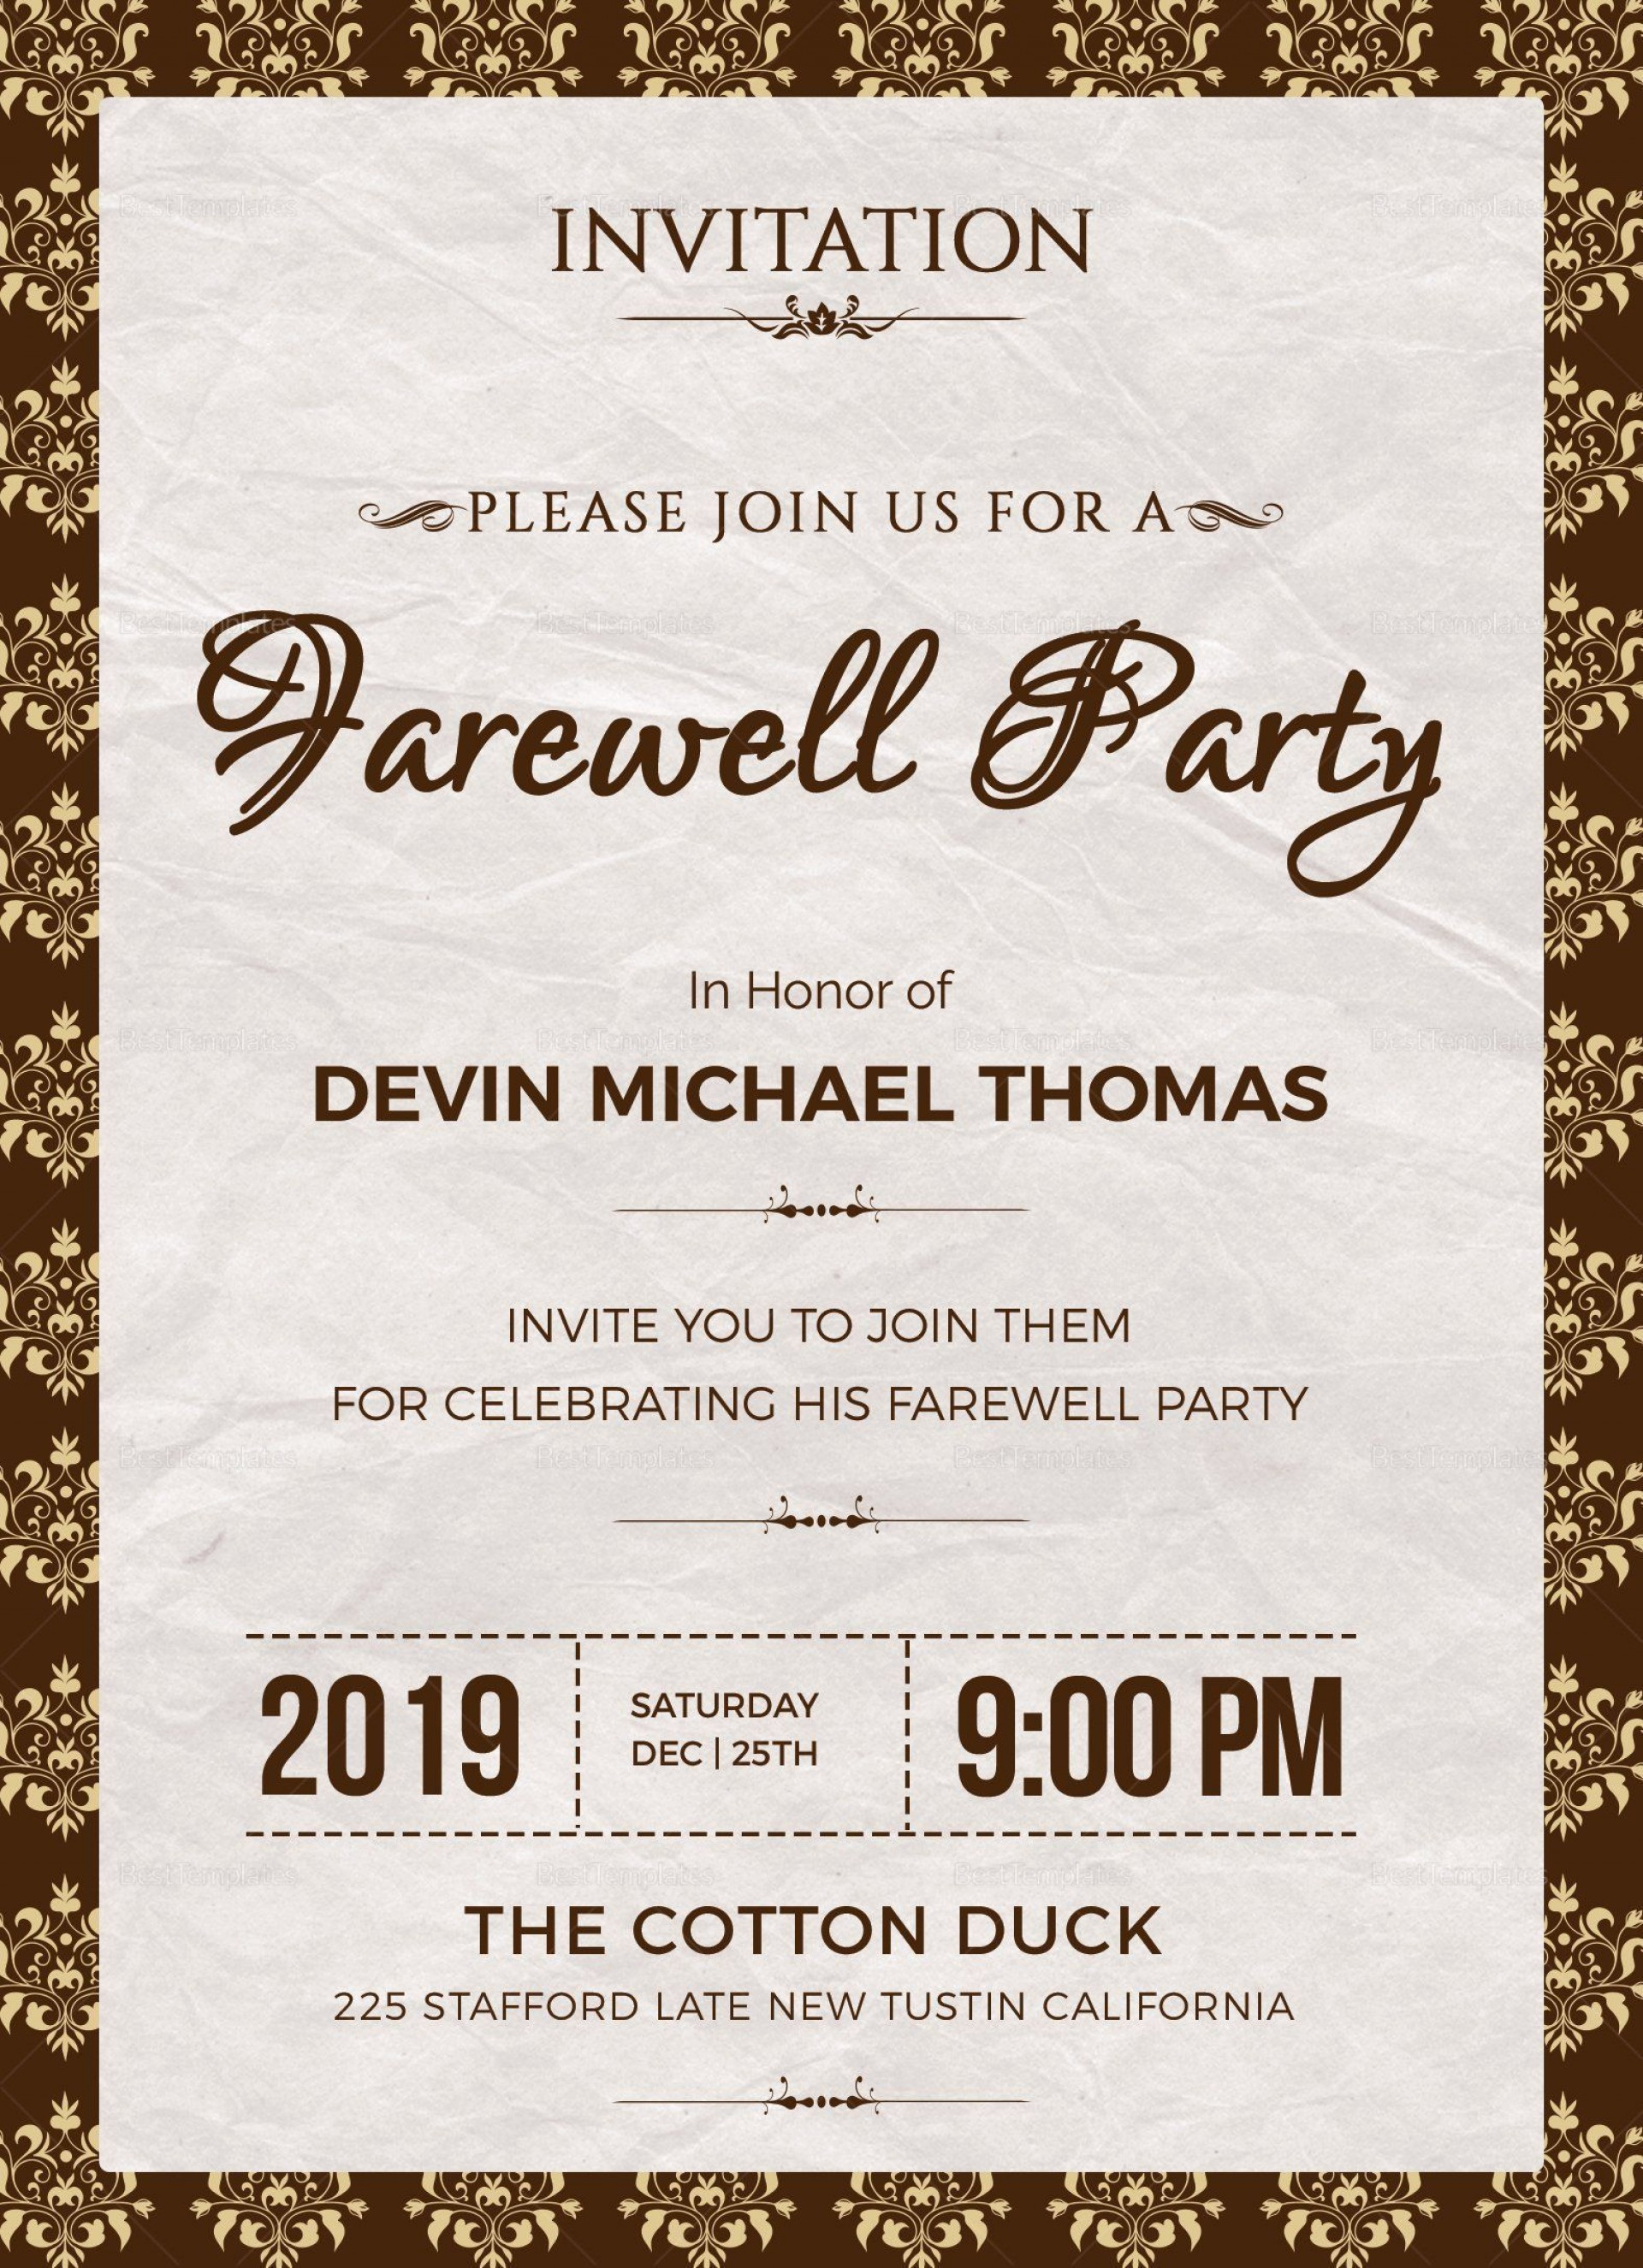 005 Phenomenal Retirement Party Invitation Template Free Printable Inspiration 1920